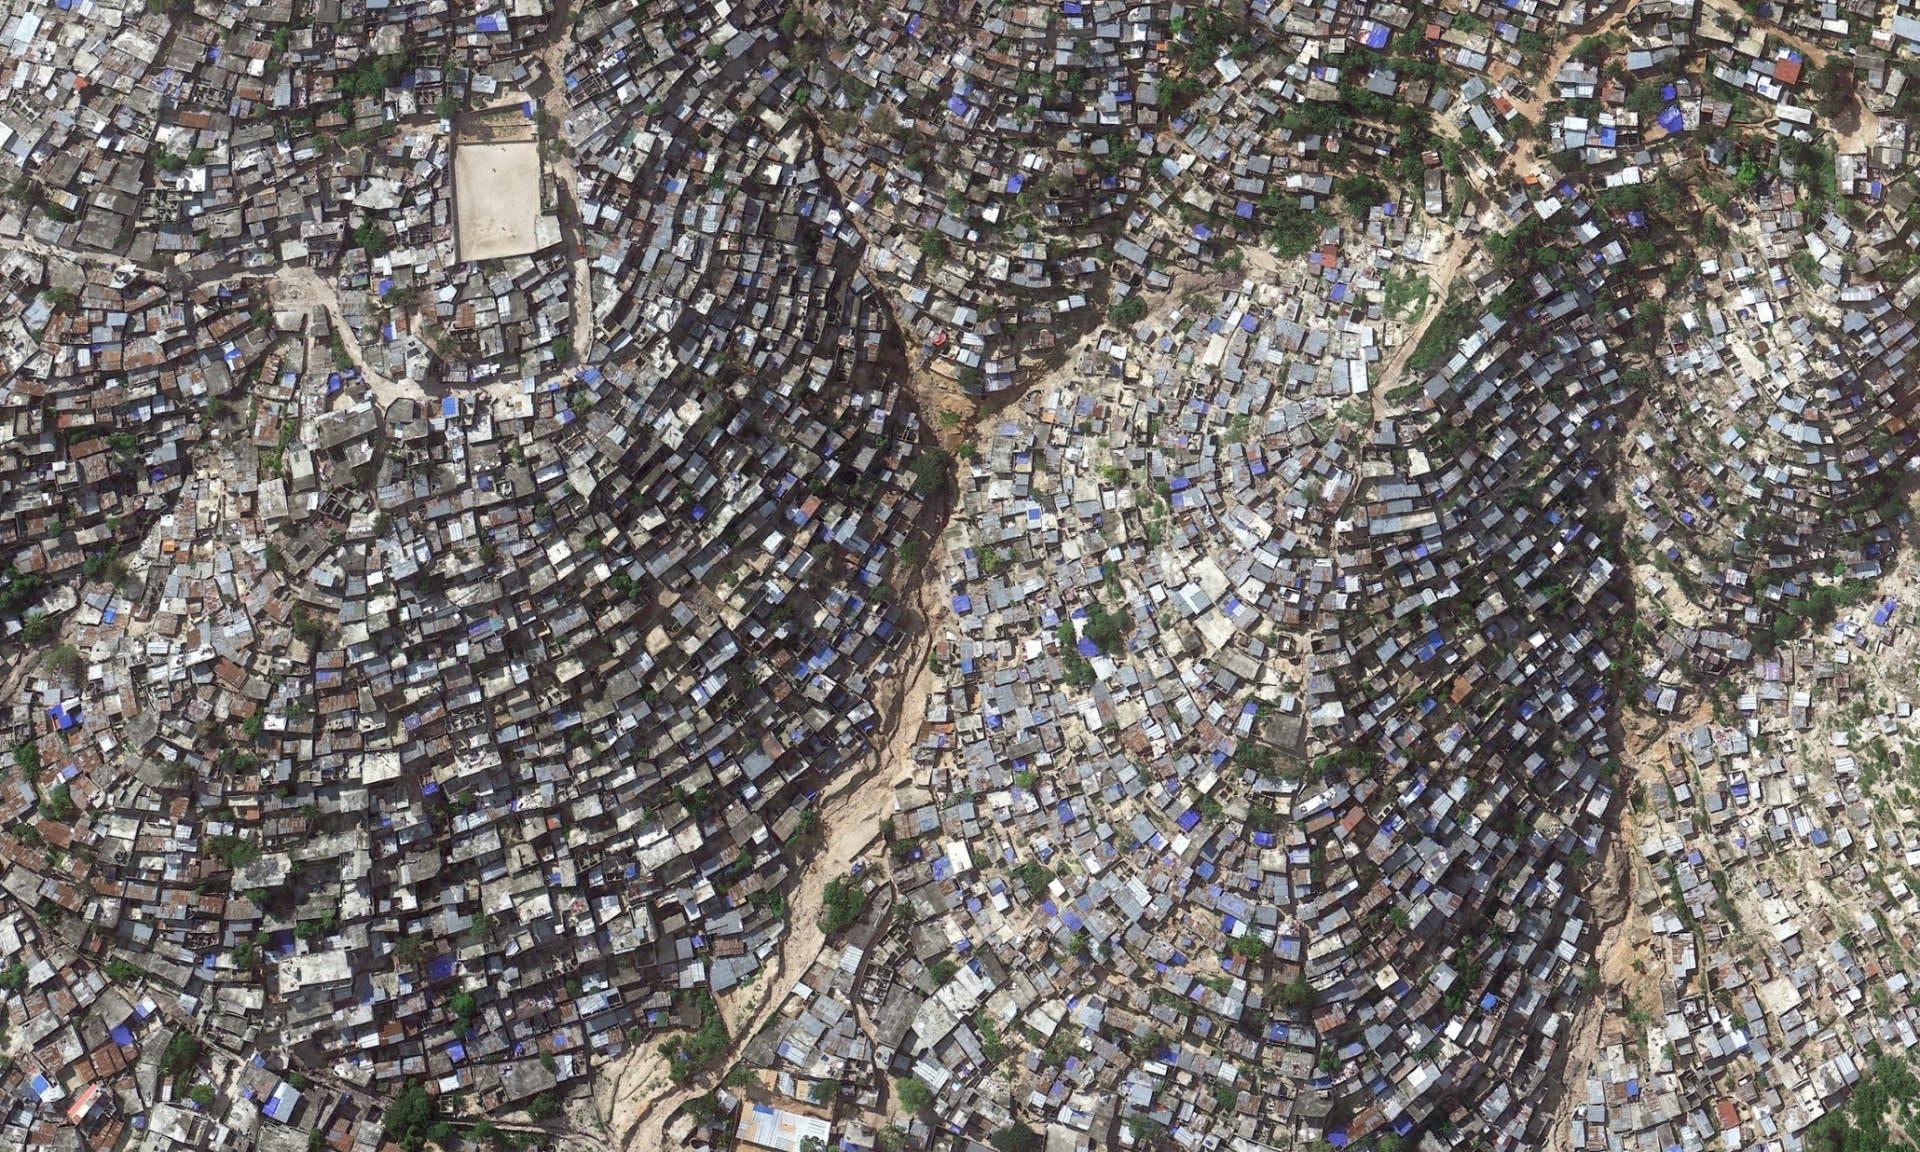 Nyomornegyed a hegyoldalban, fotó: Google Earth/2014 | ClimeNews